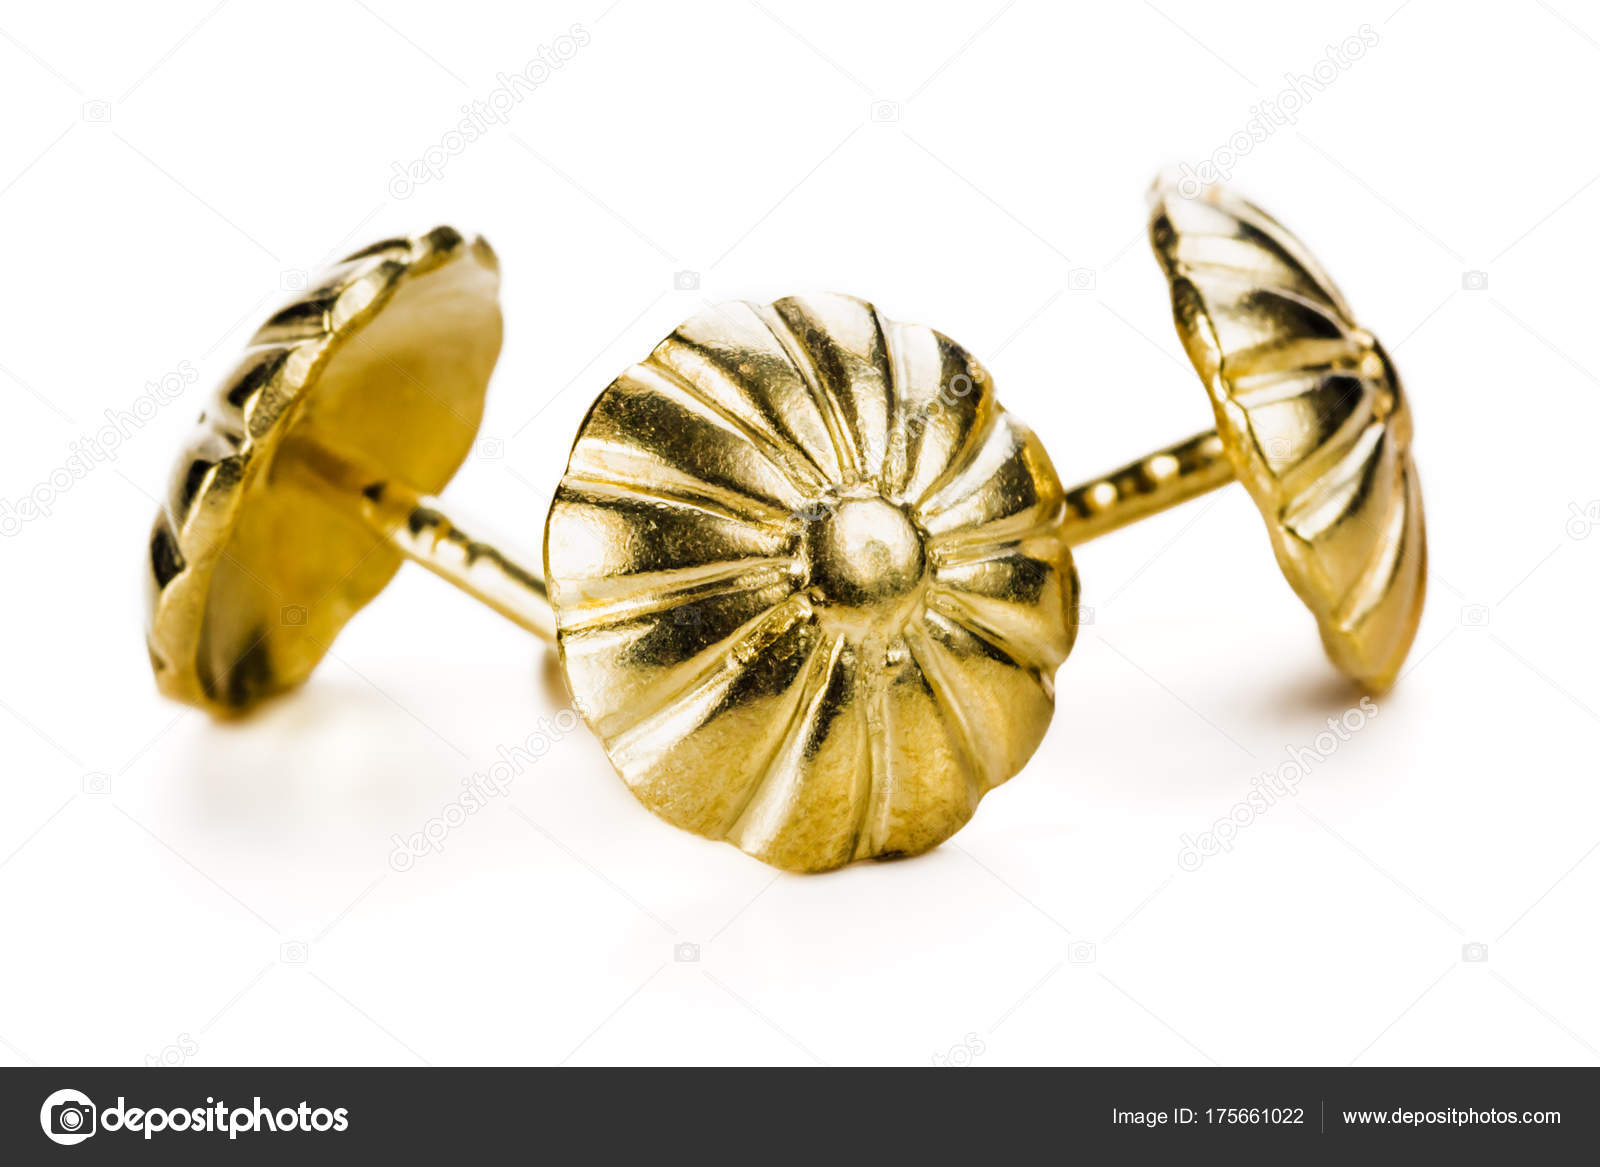 Decorative Furniture Nails — Stock Photo © pilotL39 #175661022